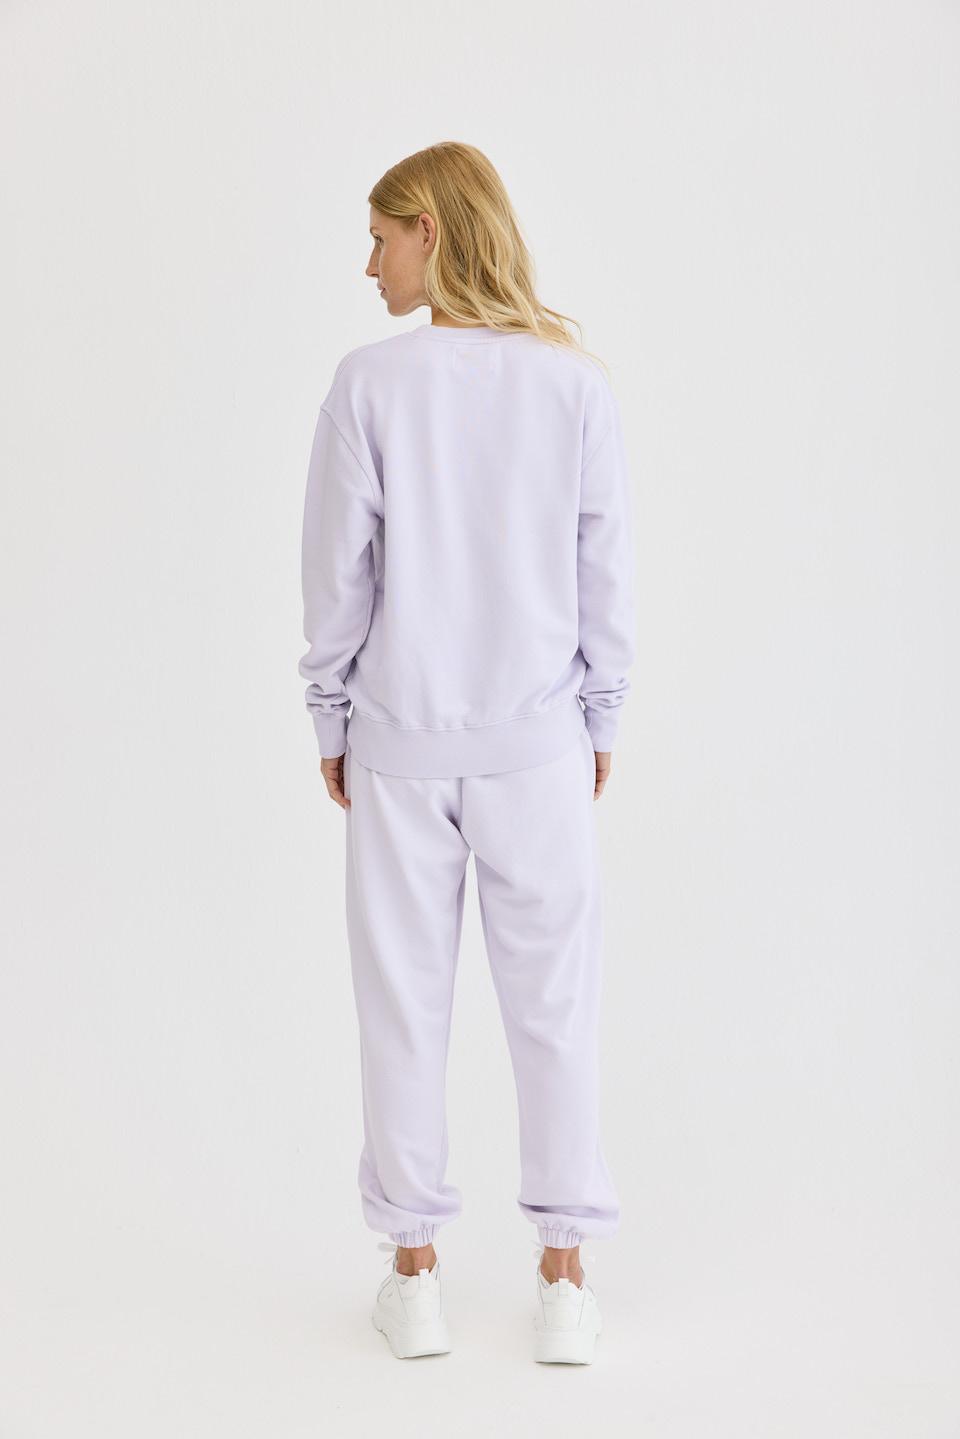 CPH Sweat 3 org. cotton lavender - alternative 1